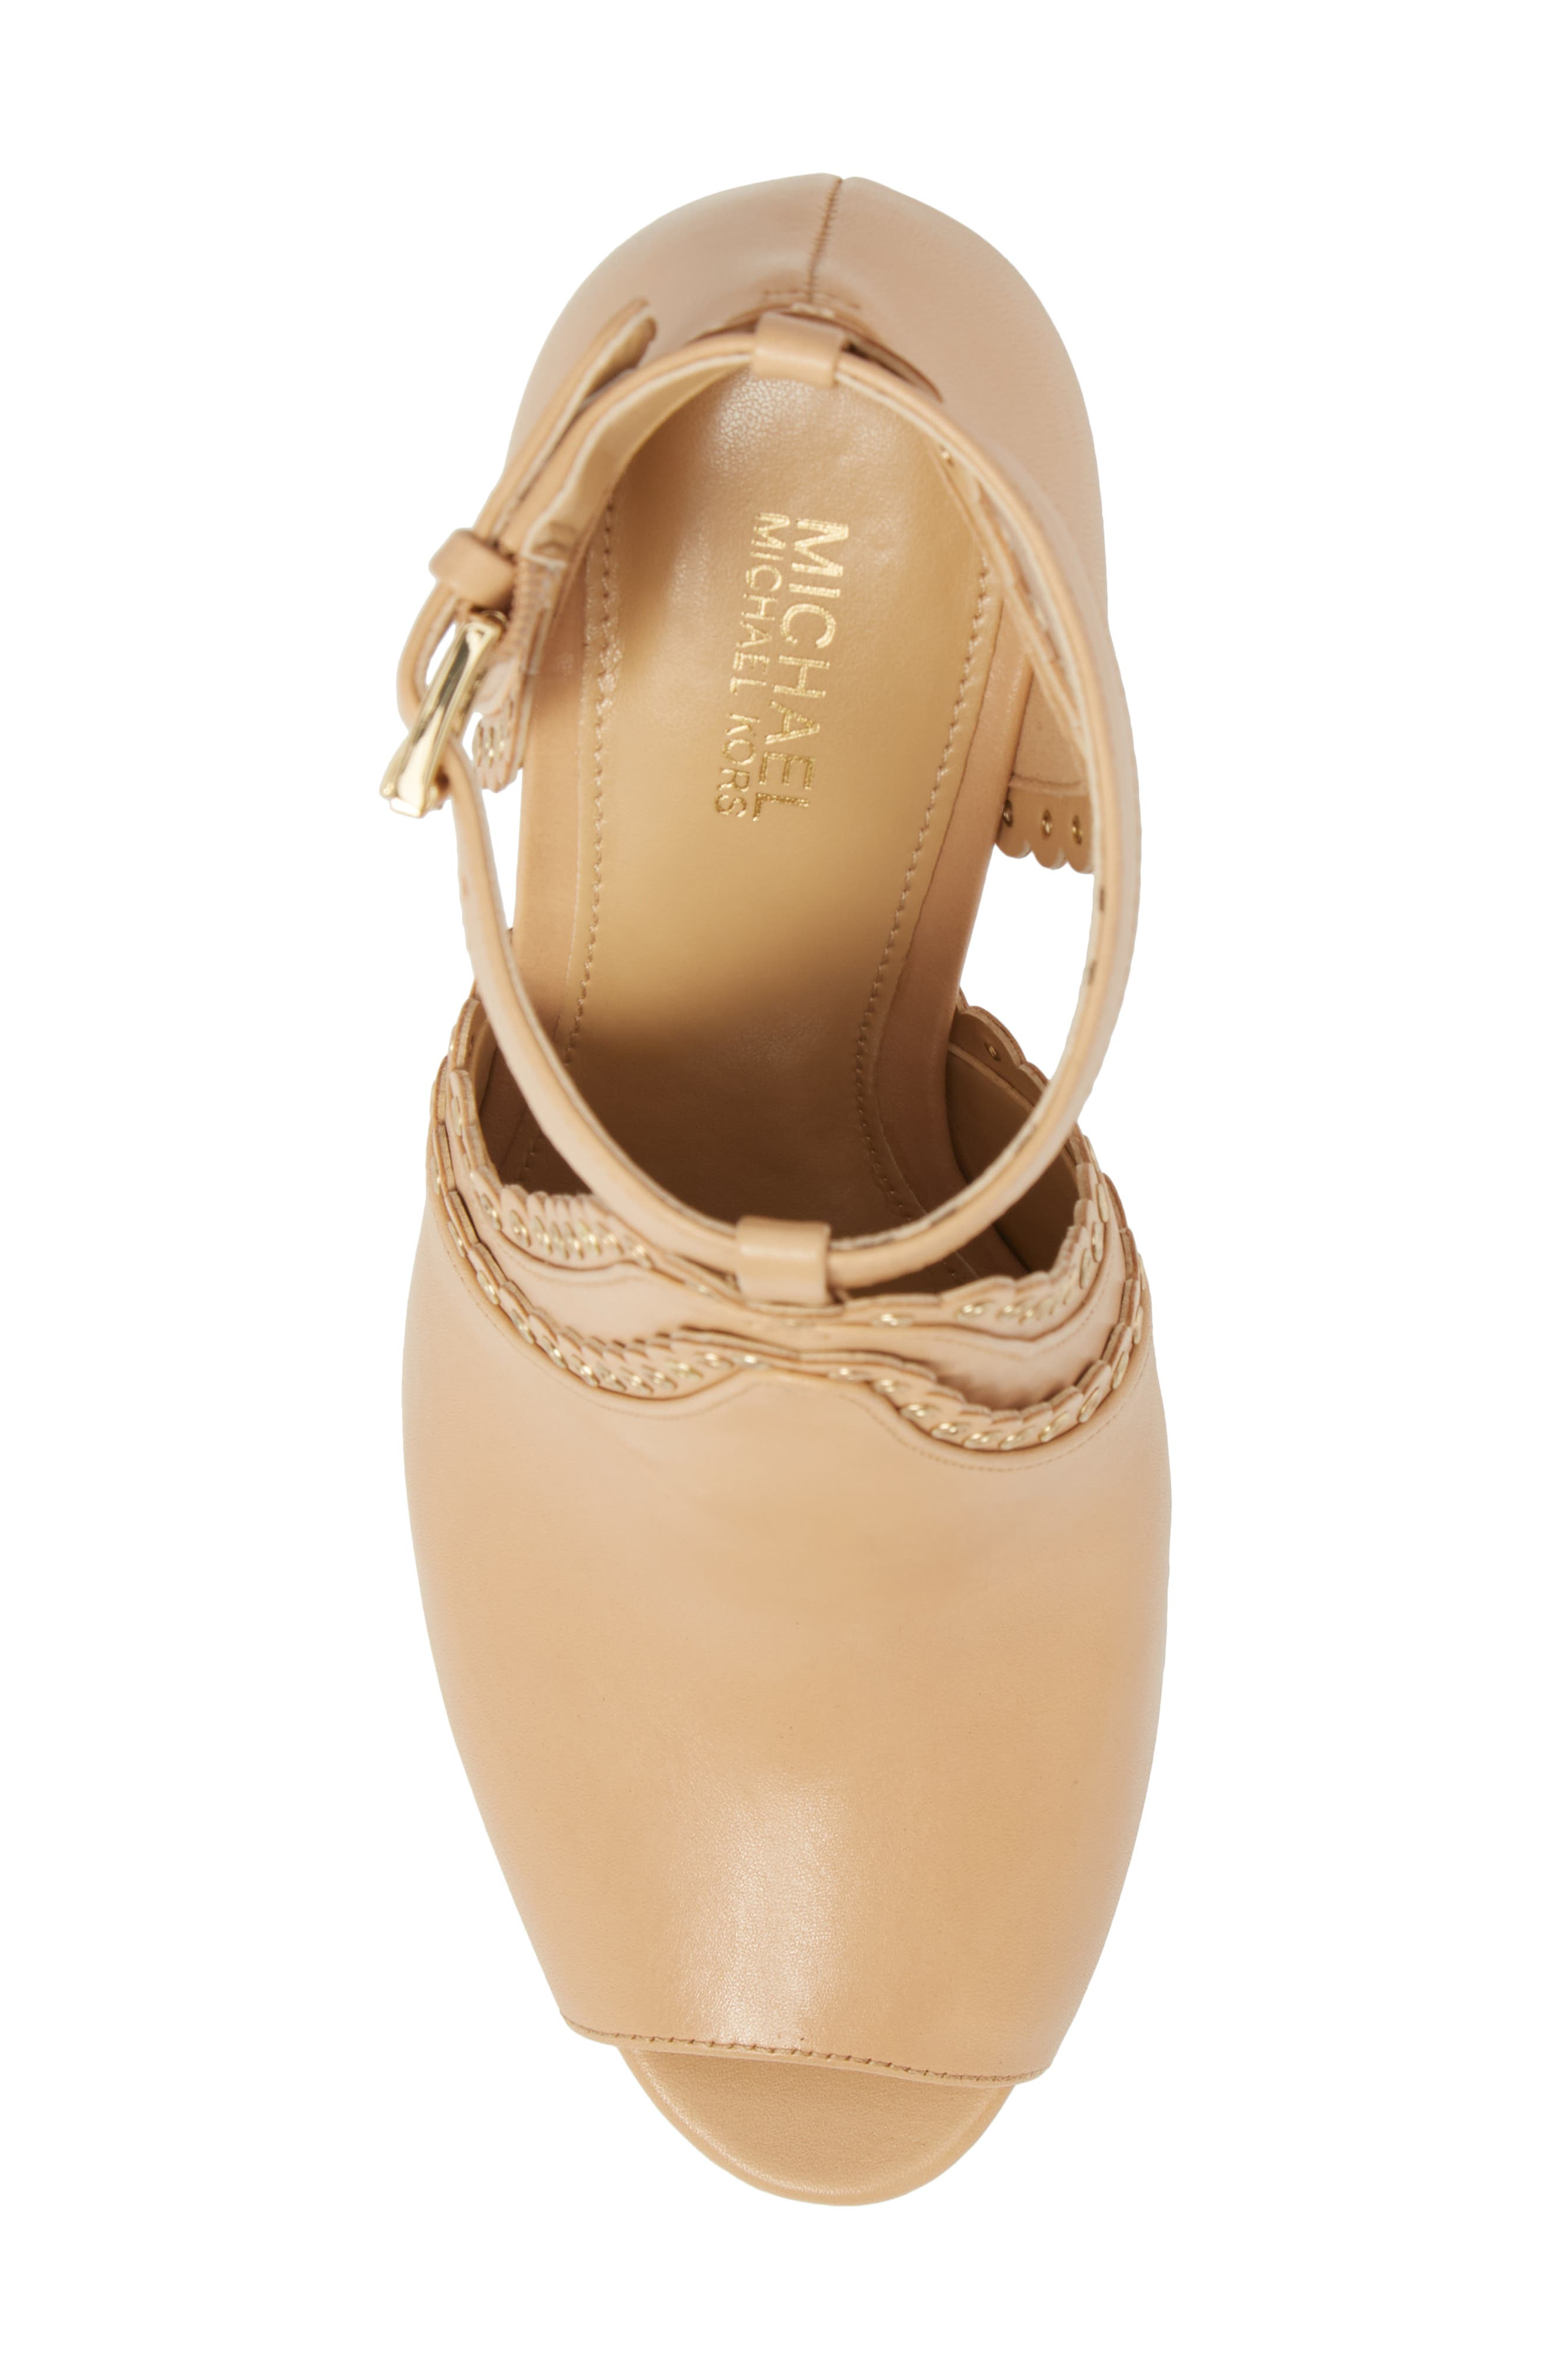 Jessie Ankle Strap Sandal,                             Alternate thumbnail 5, color,                             BUTTERNUT LEATHER